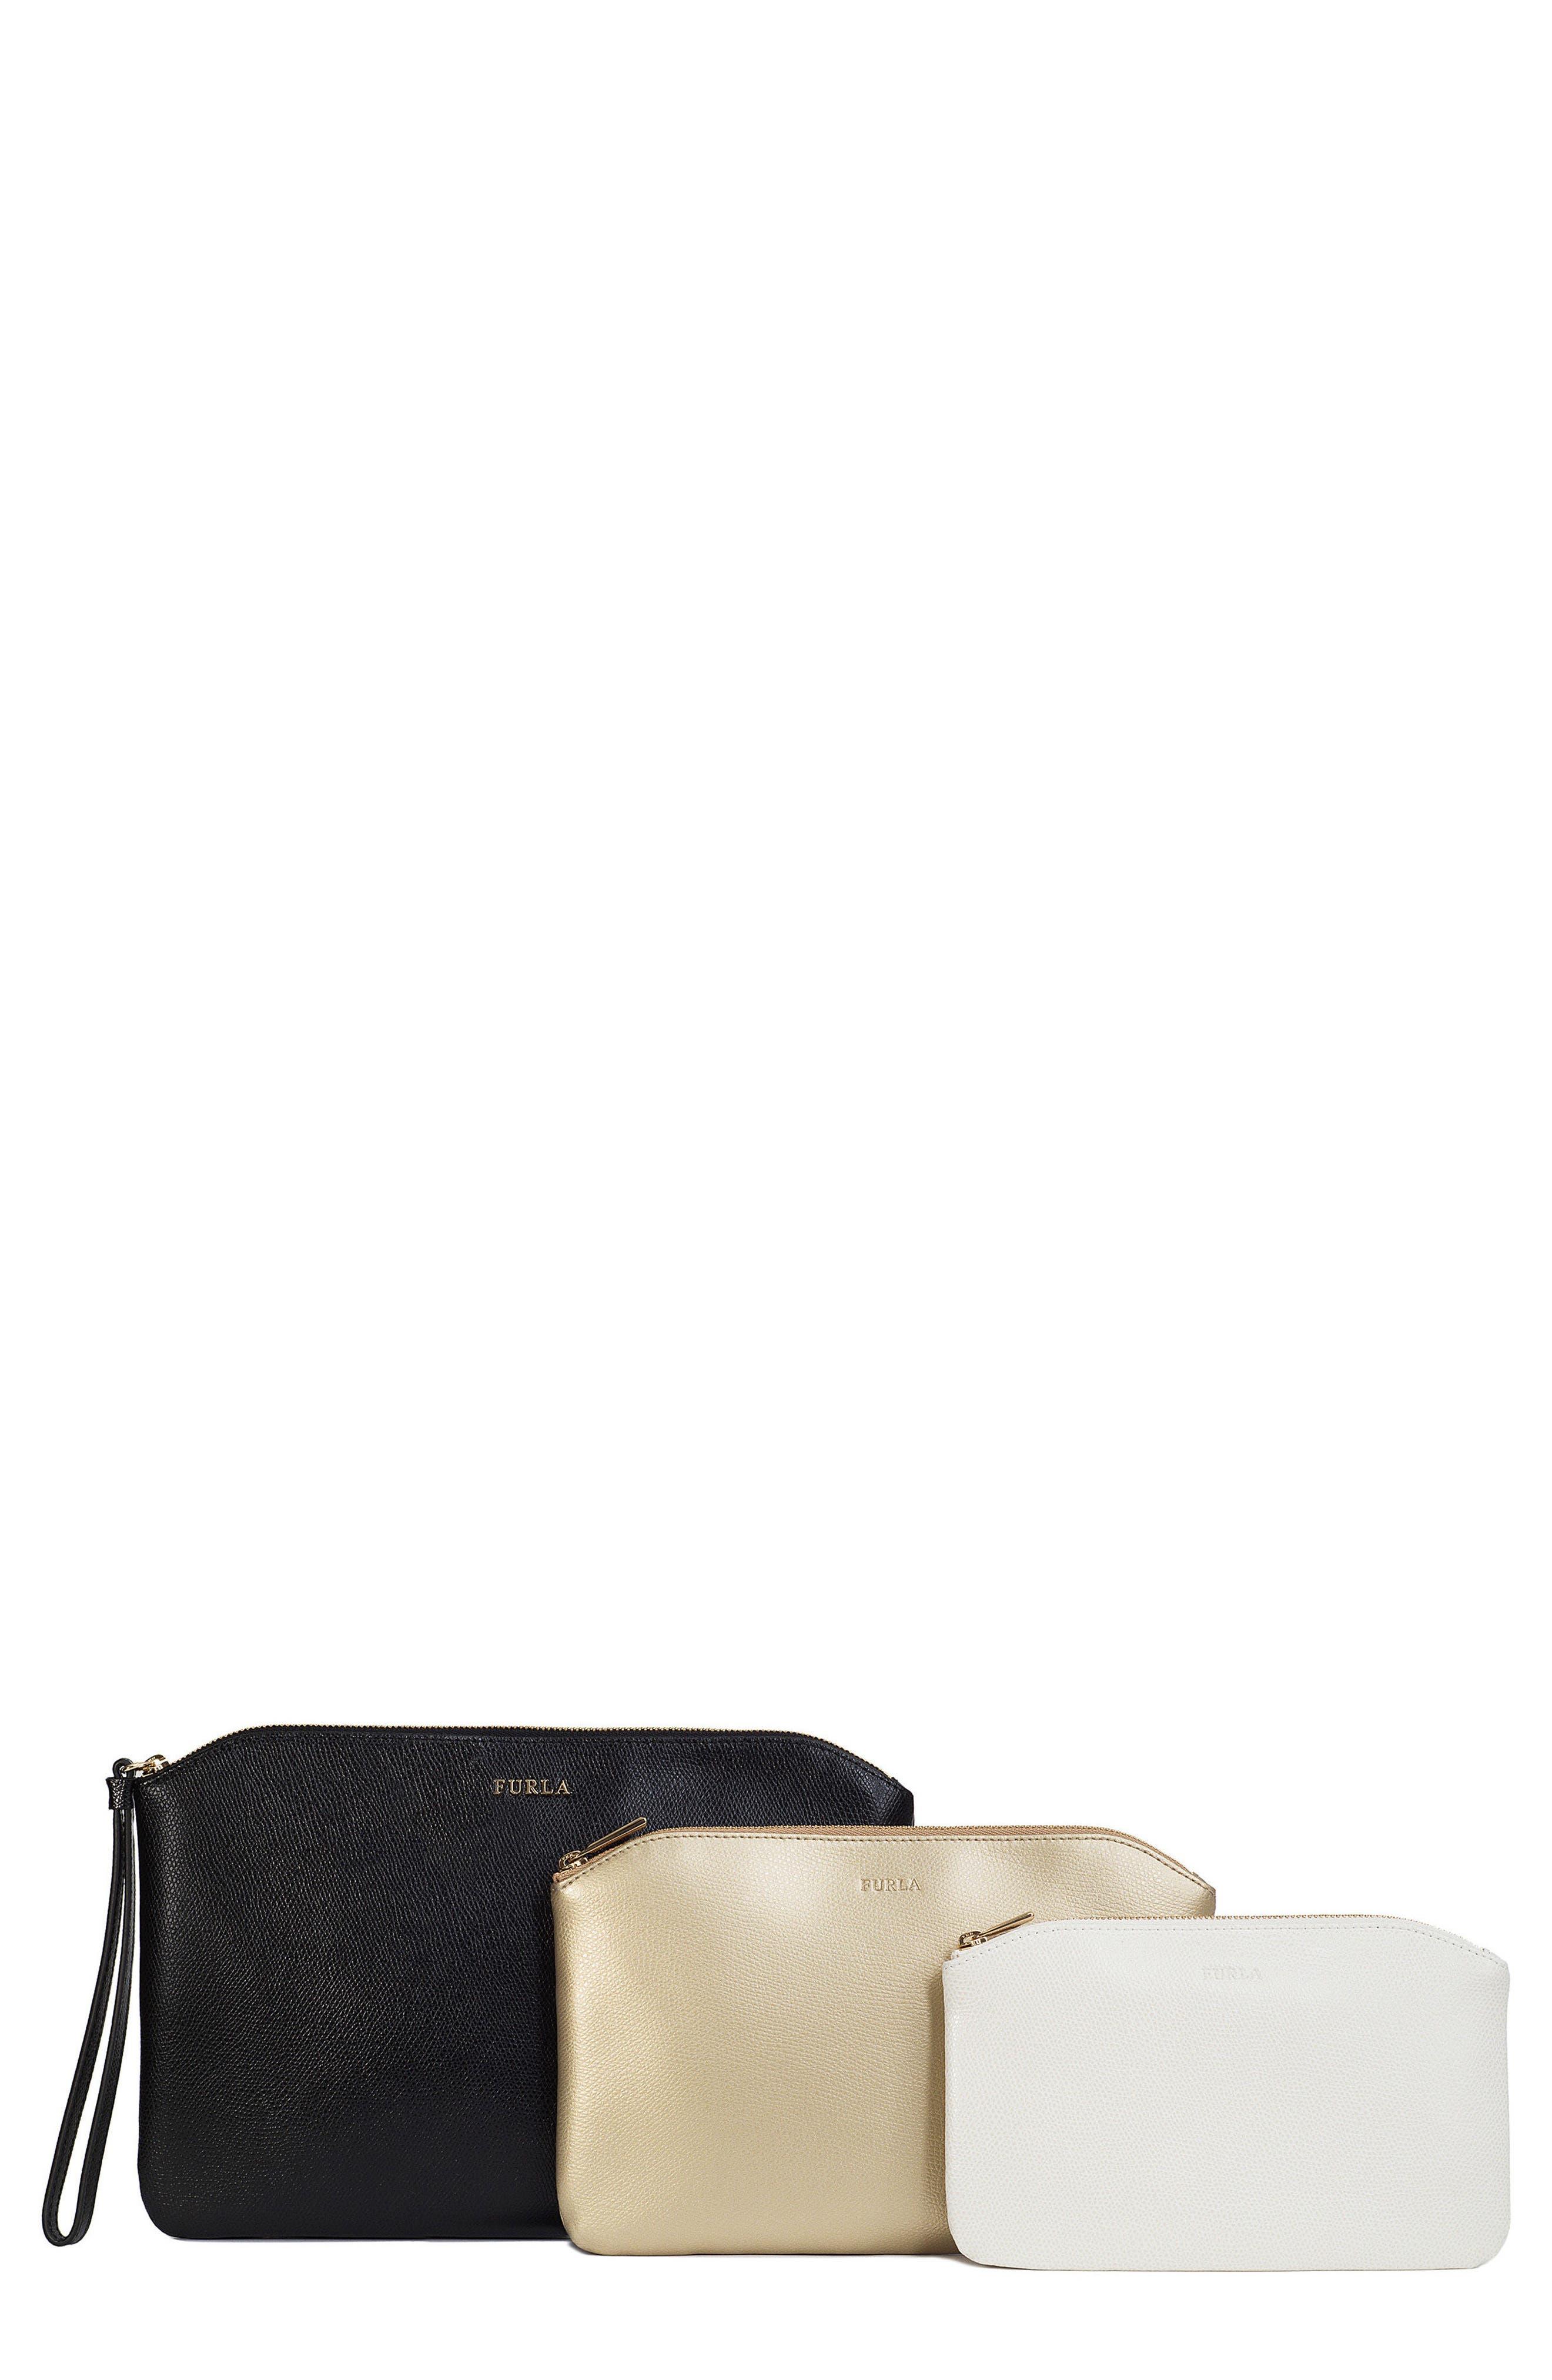 Venere Set of 3 Leather Cosmetic Bags,                             Main thumbnail 1, color,                             Onyx/ Gold/ Petalo